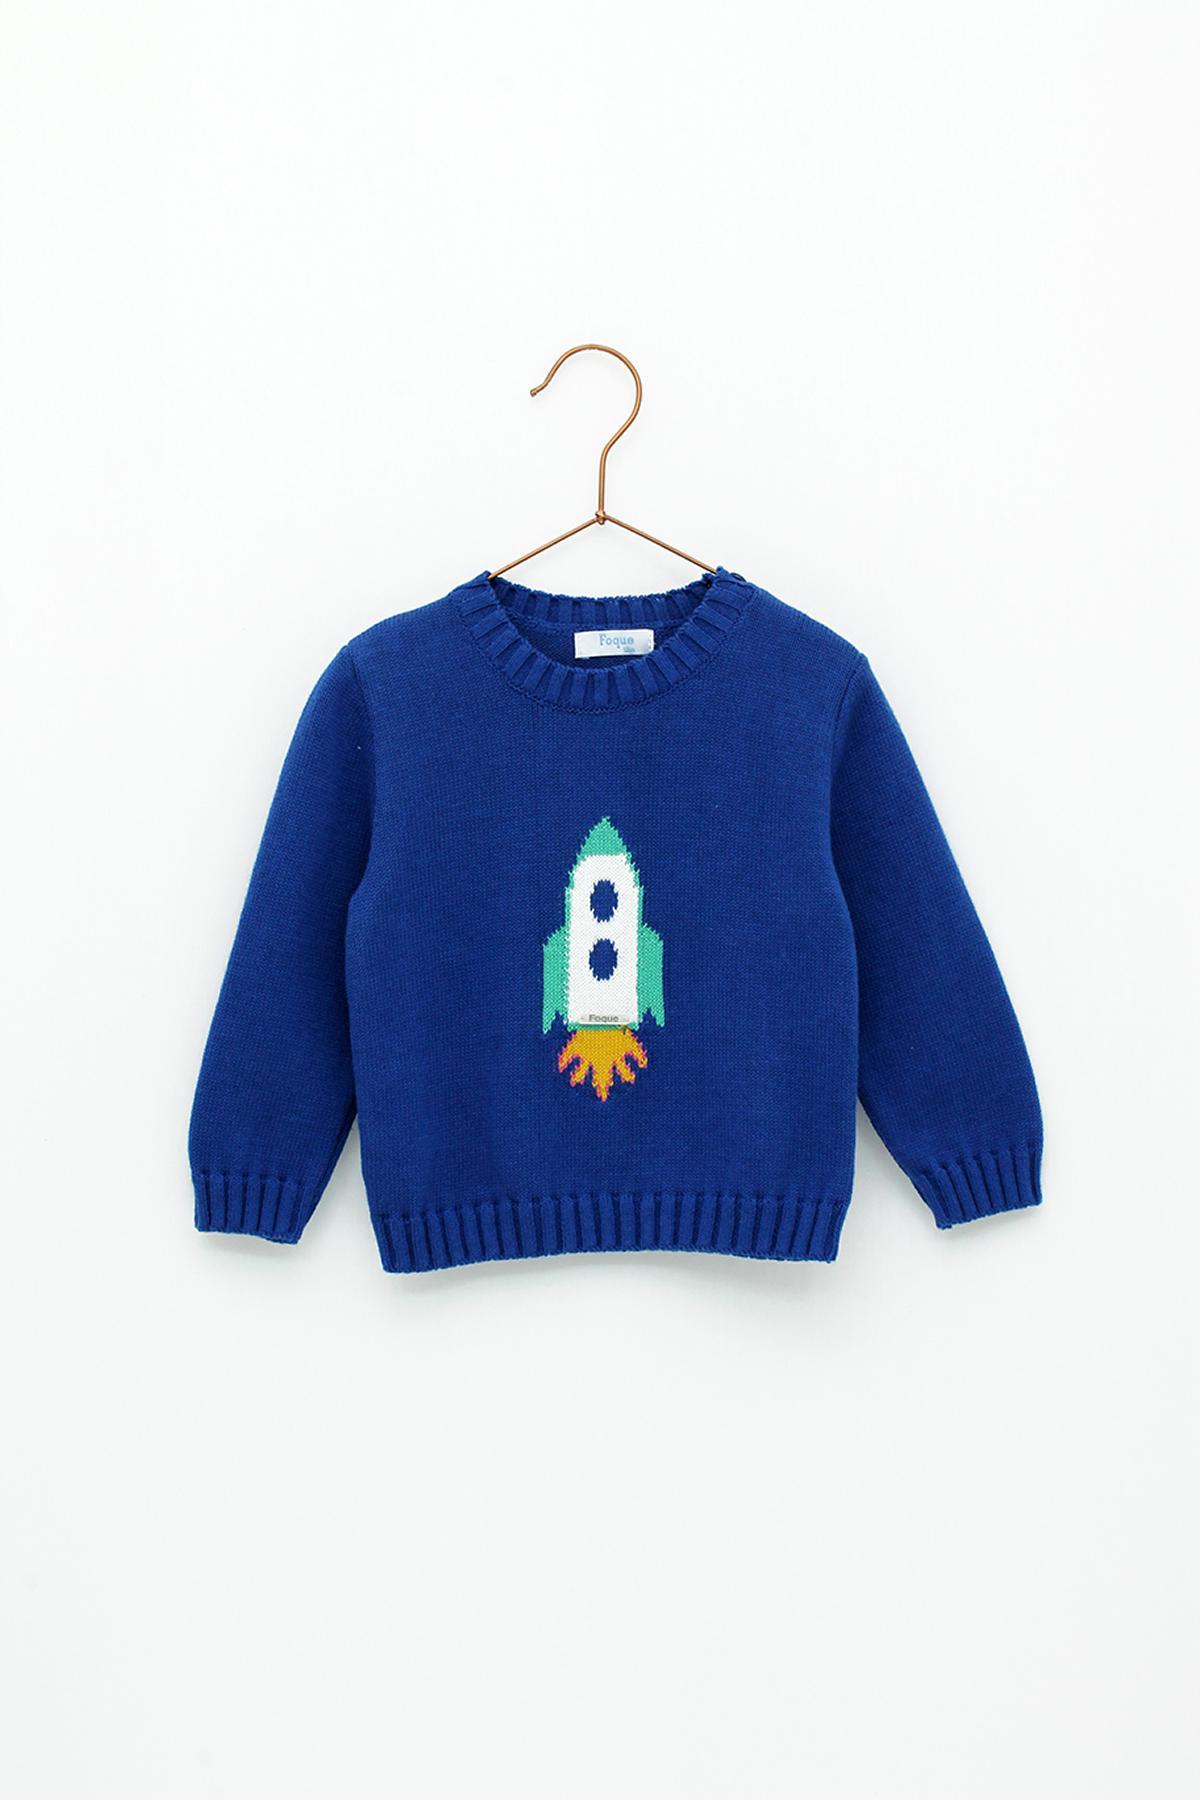 Jersey Foque mod. Cohete color azul .